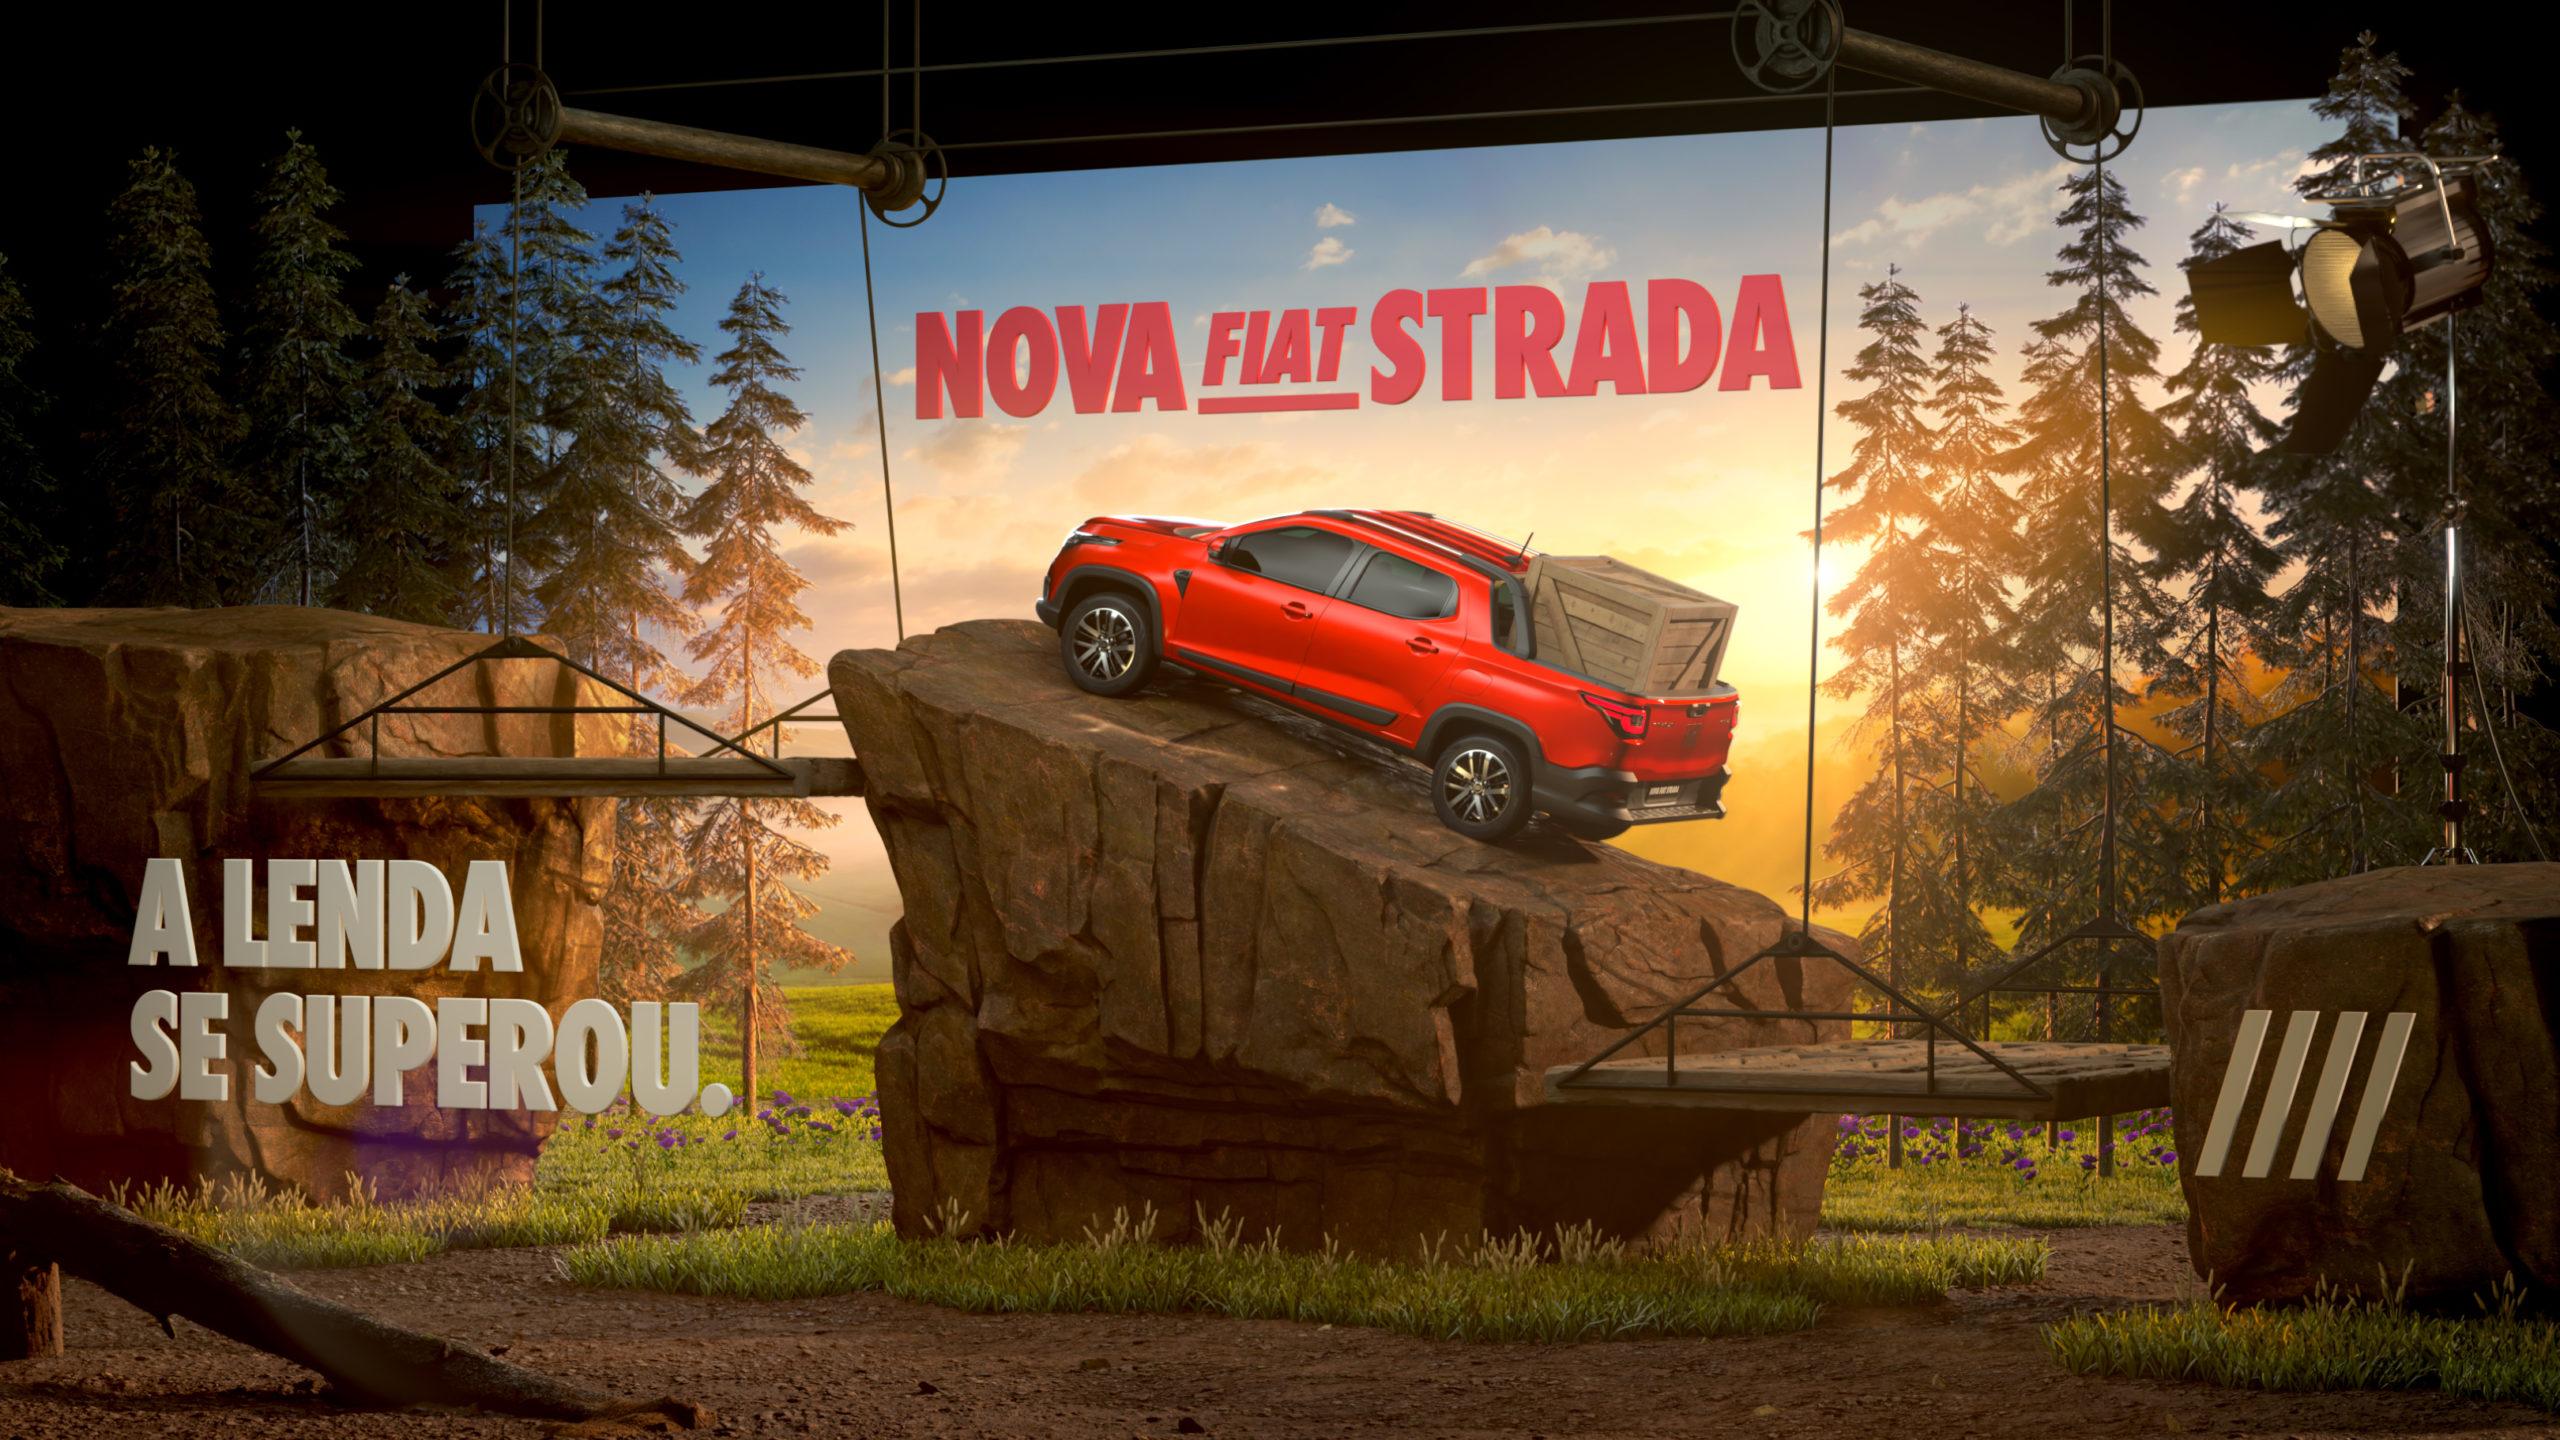 Nova Fiat Strada